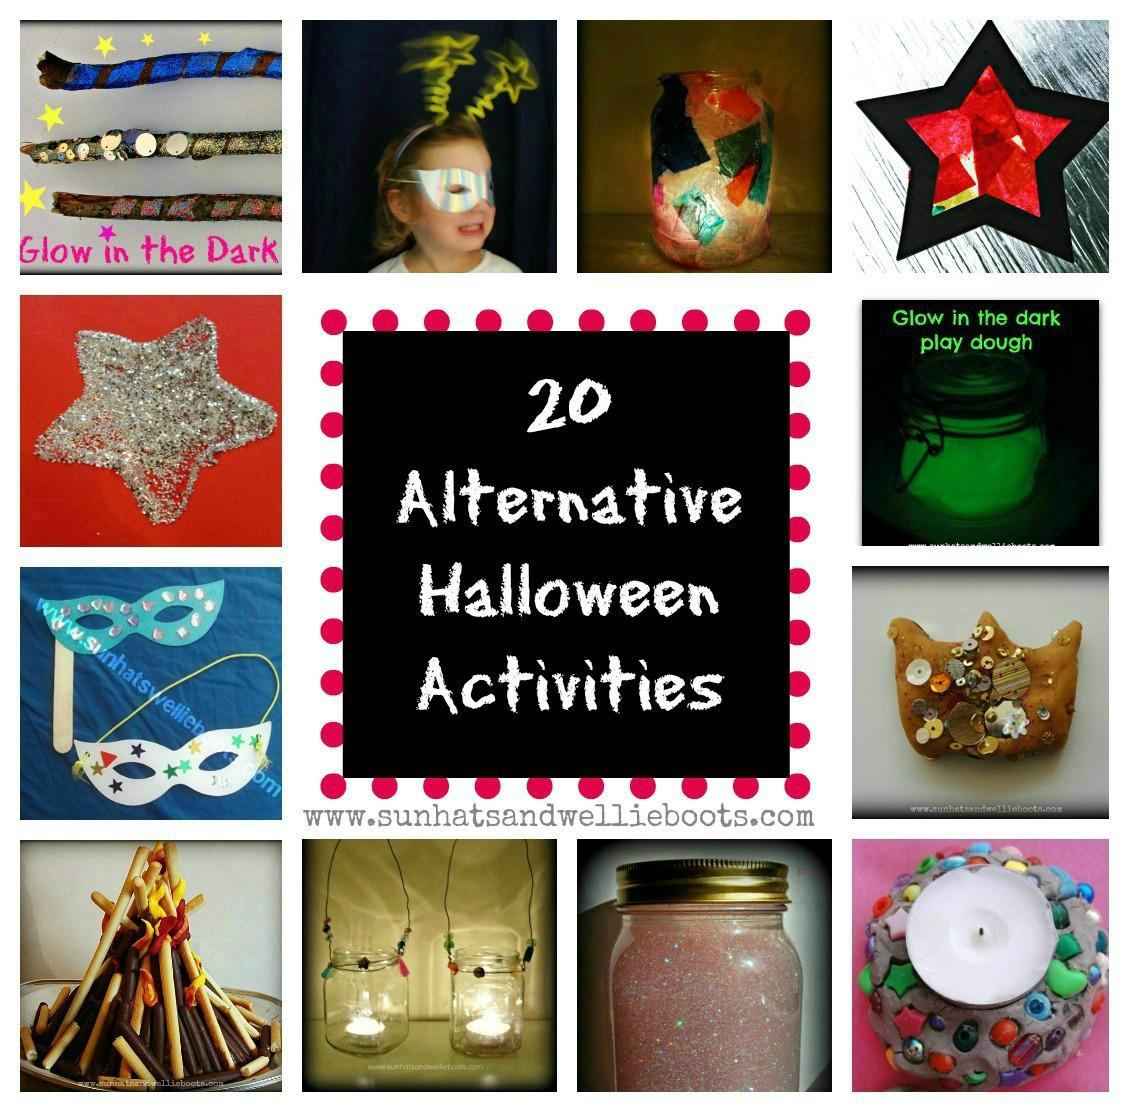 Sun Hats & Wellie Boots: 20 Alternative Halloween Activities ...